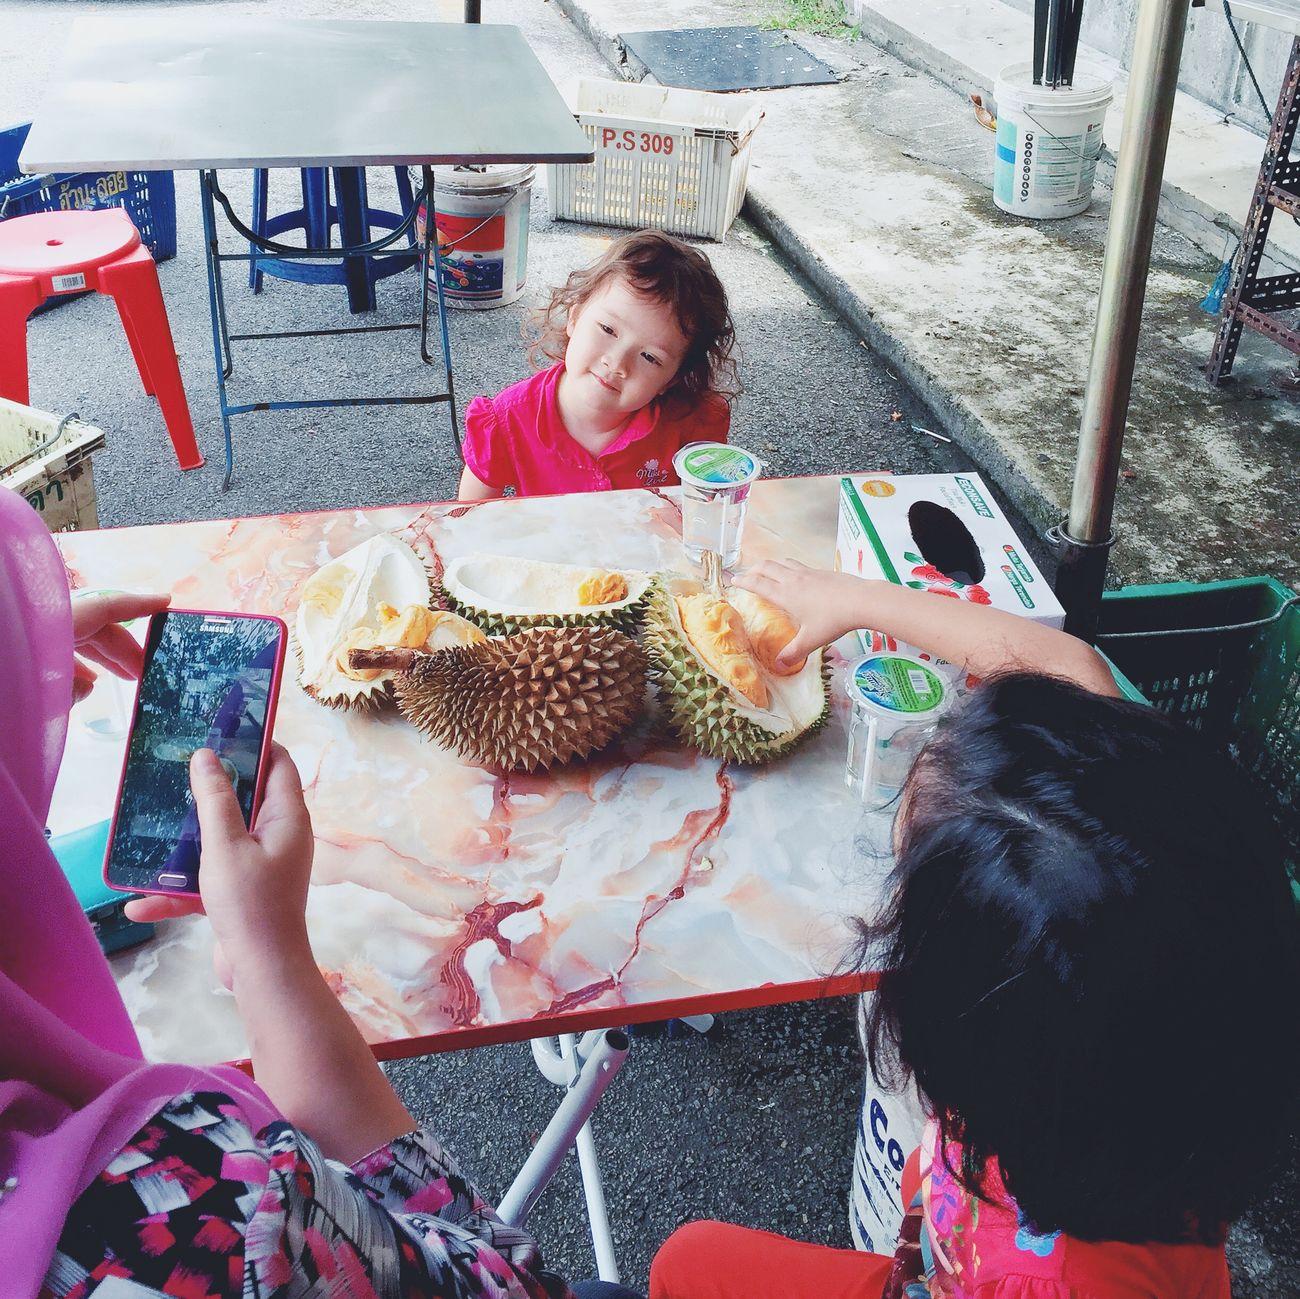 Mealtime VSCO Vscocam Durian